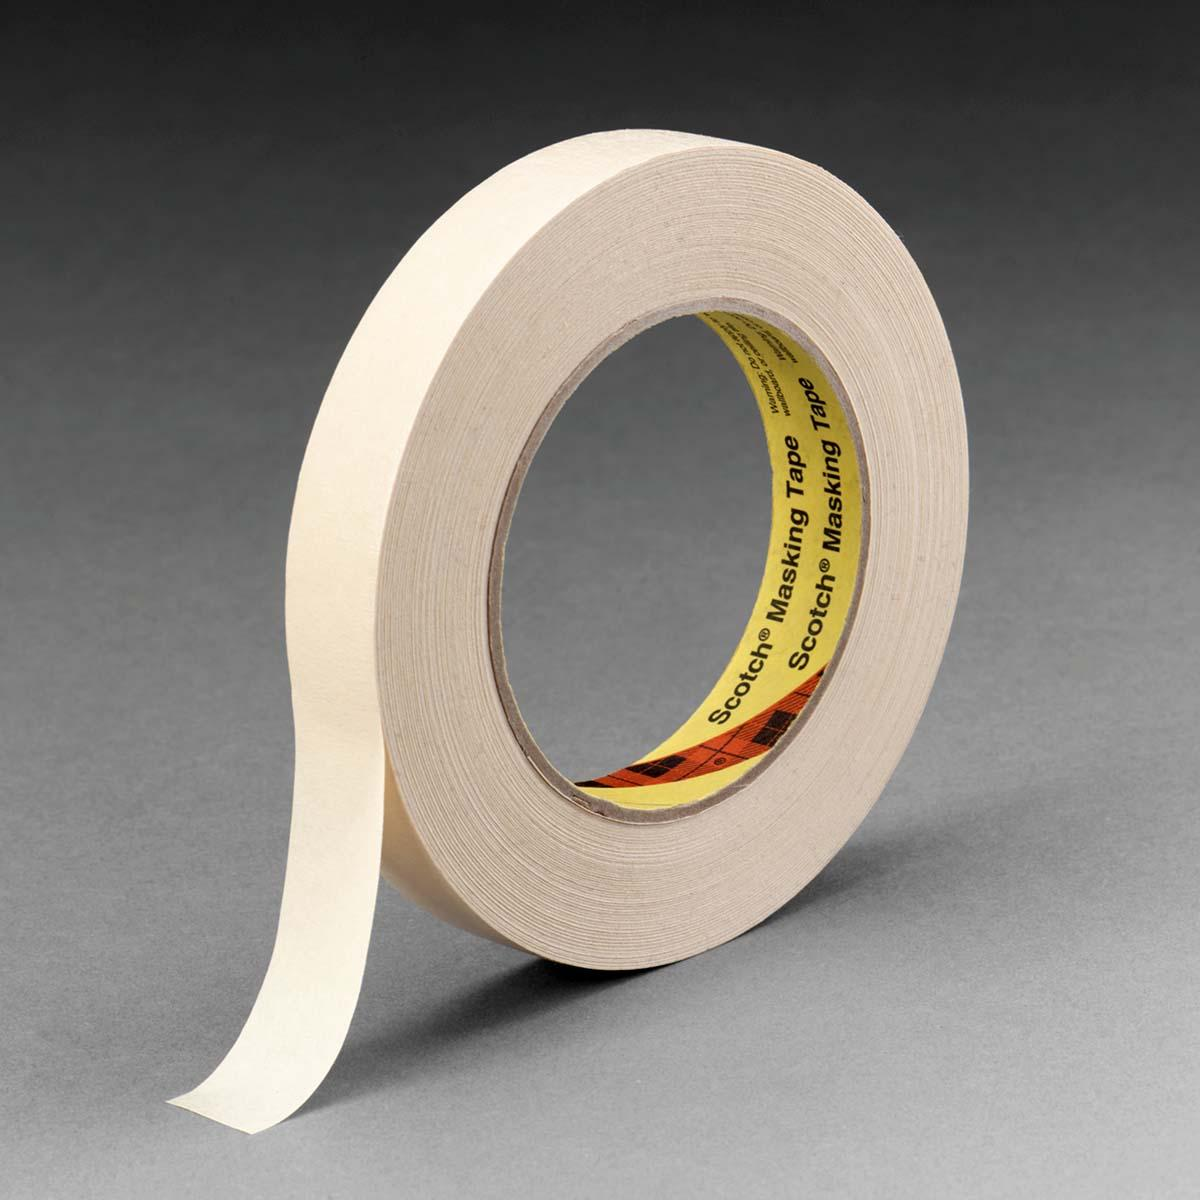 3M High Performance Masking Tape 232 Tan, 24 mm x 55 m 6.3 mil, 36 per case Bulk